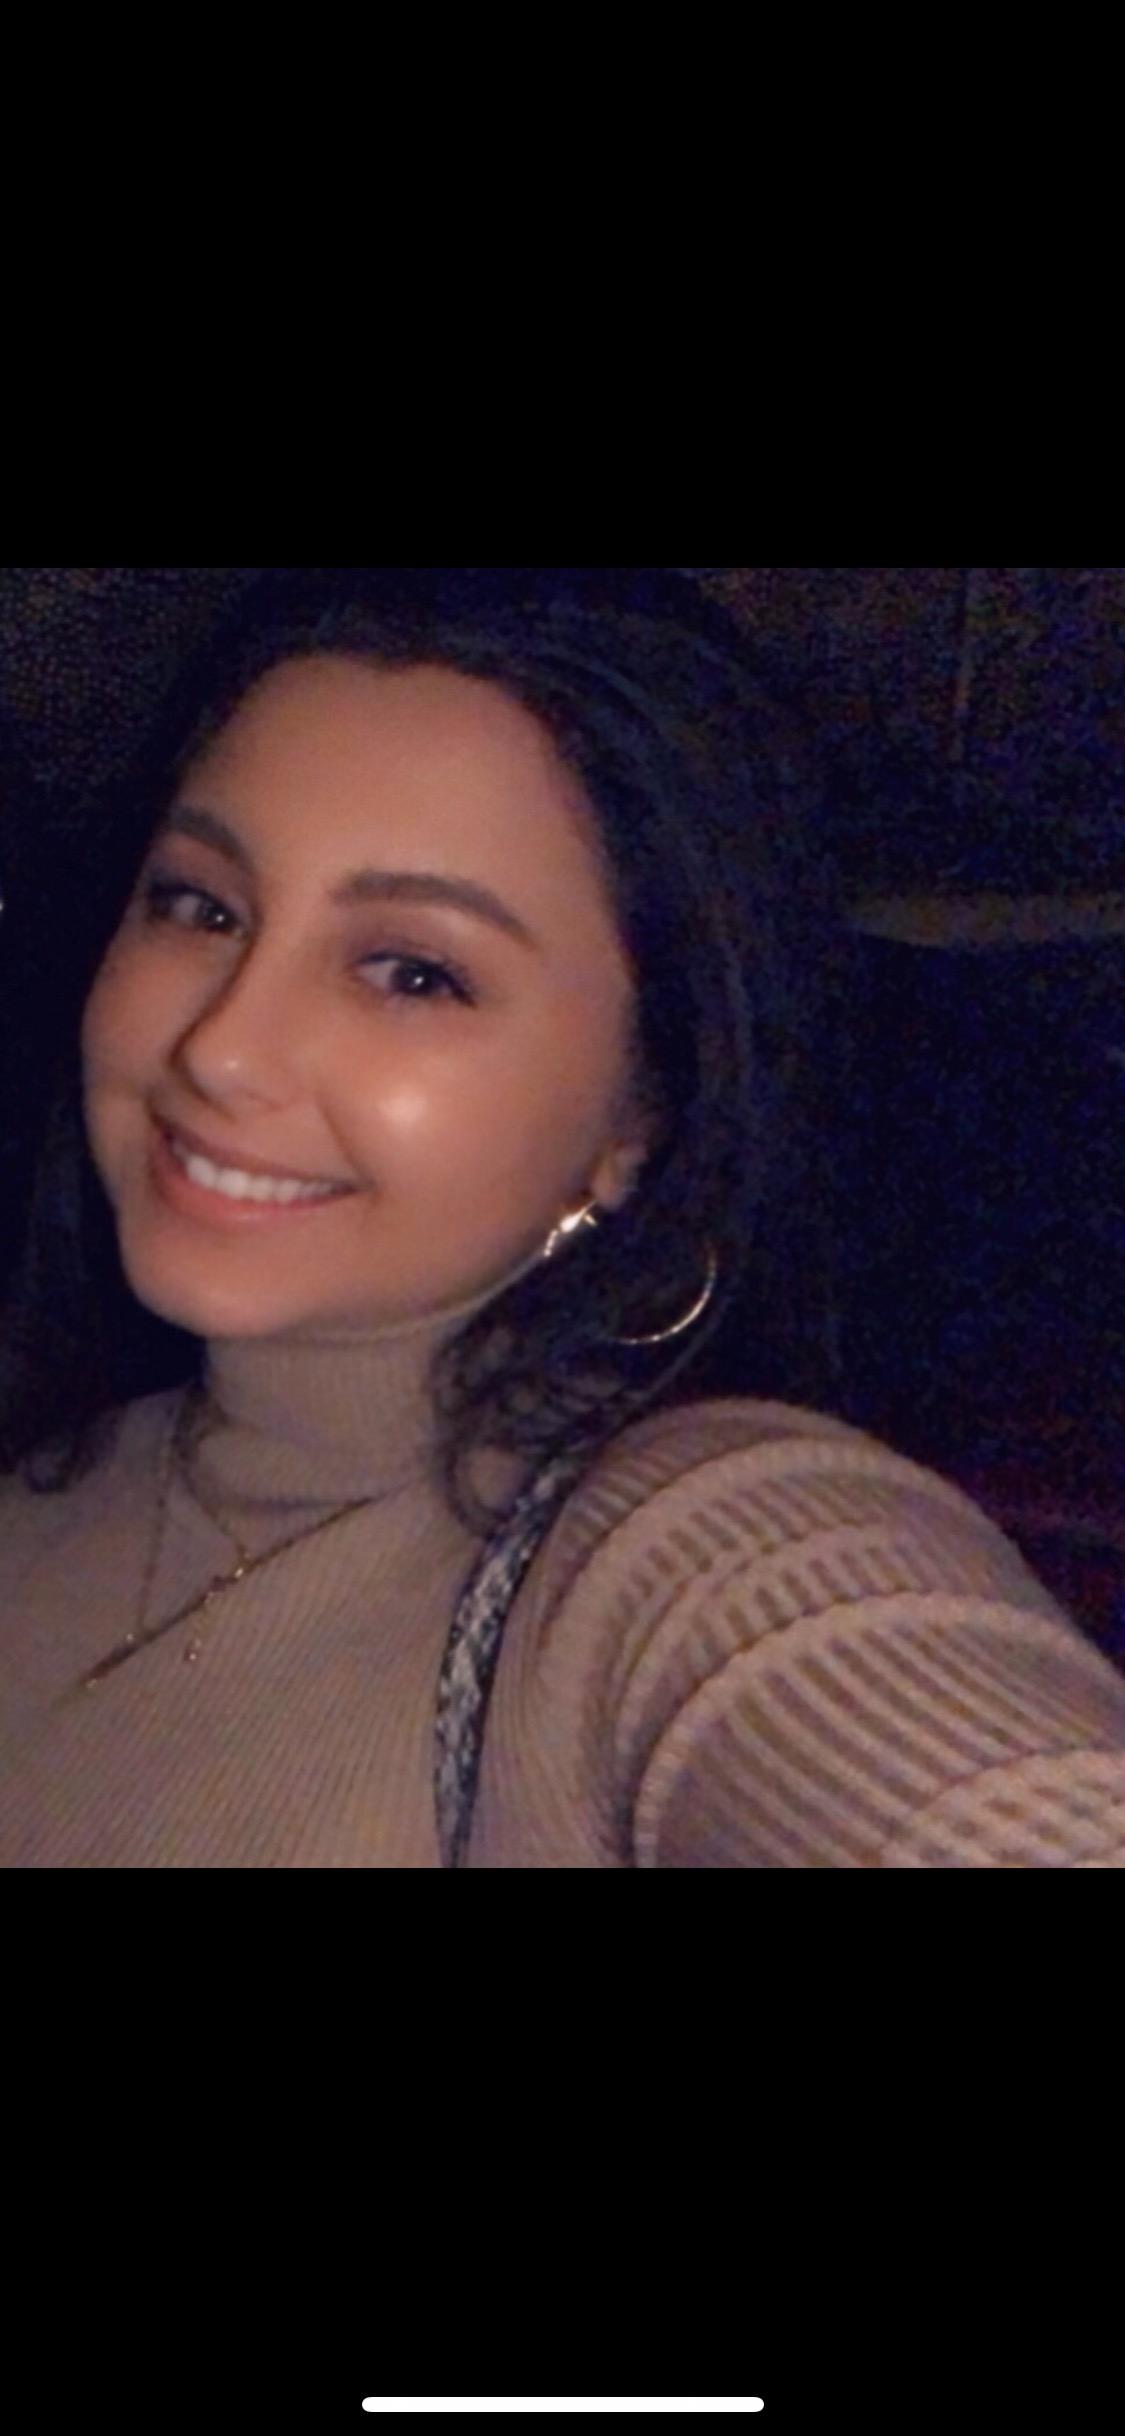 Malanda Malan, Sterling Heights, 22